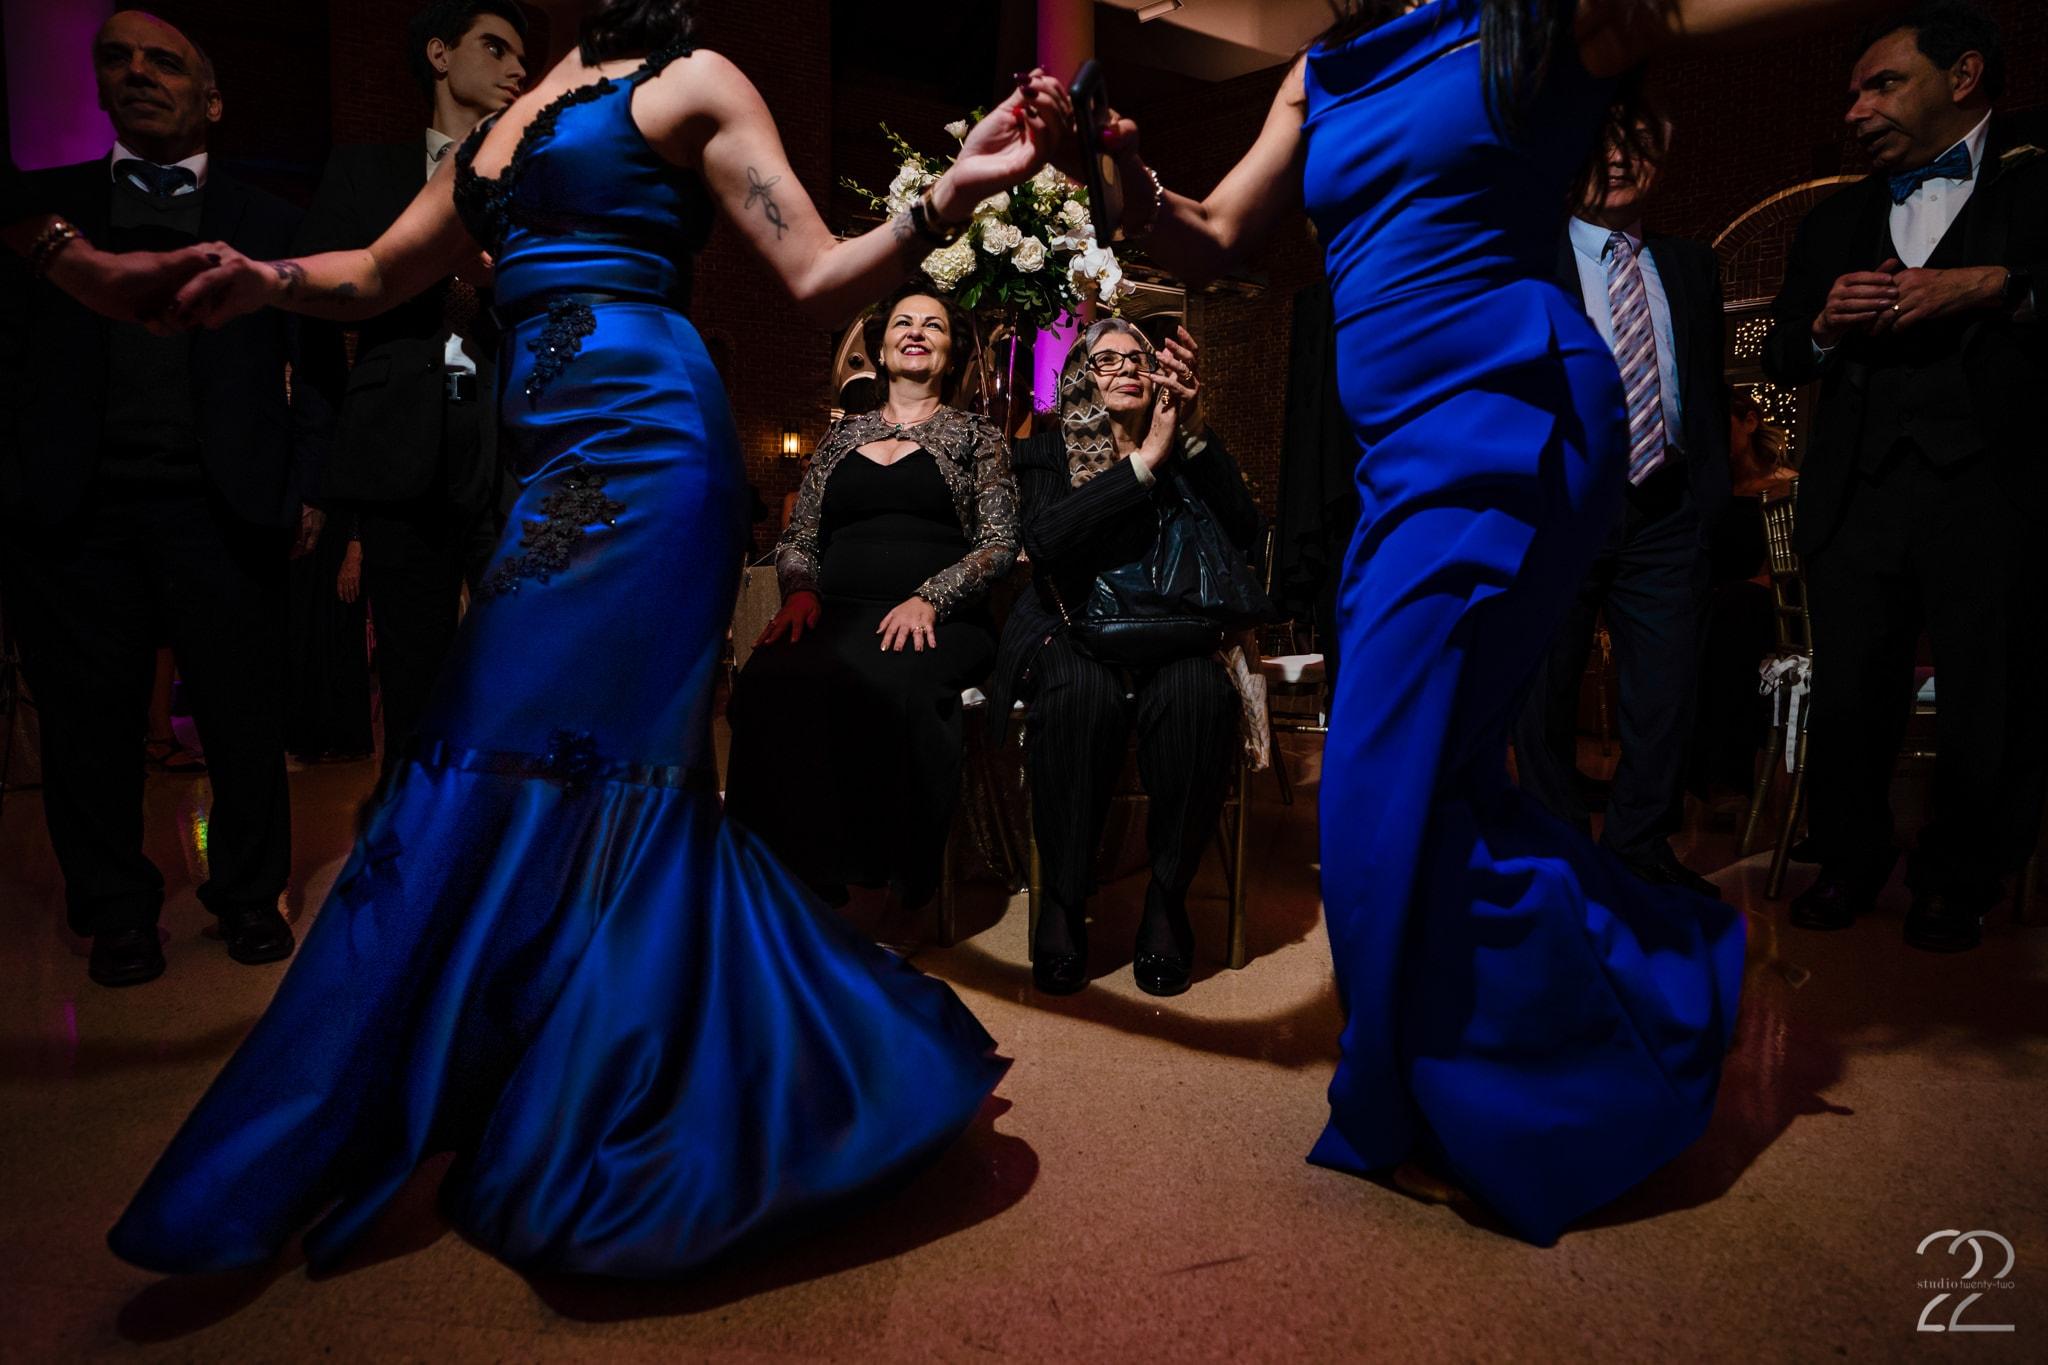 Wedding Receptions at Dayton Art Institute - Studio 22 Photography